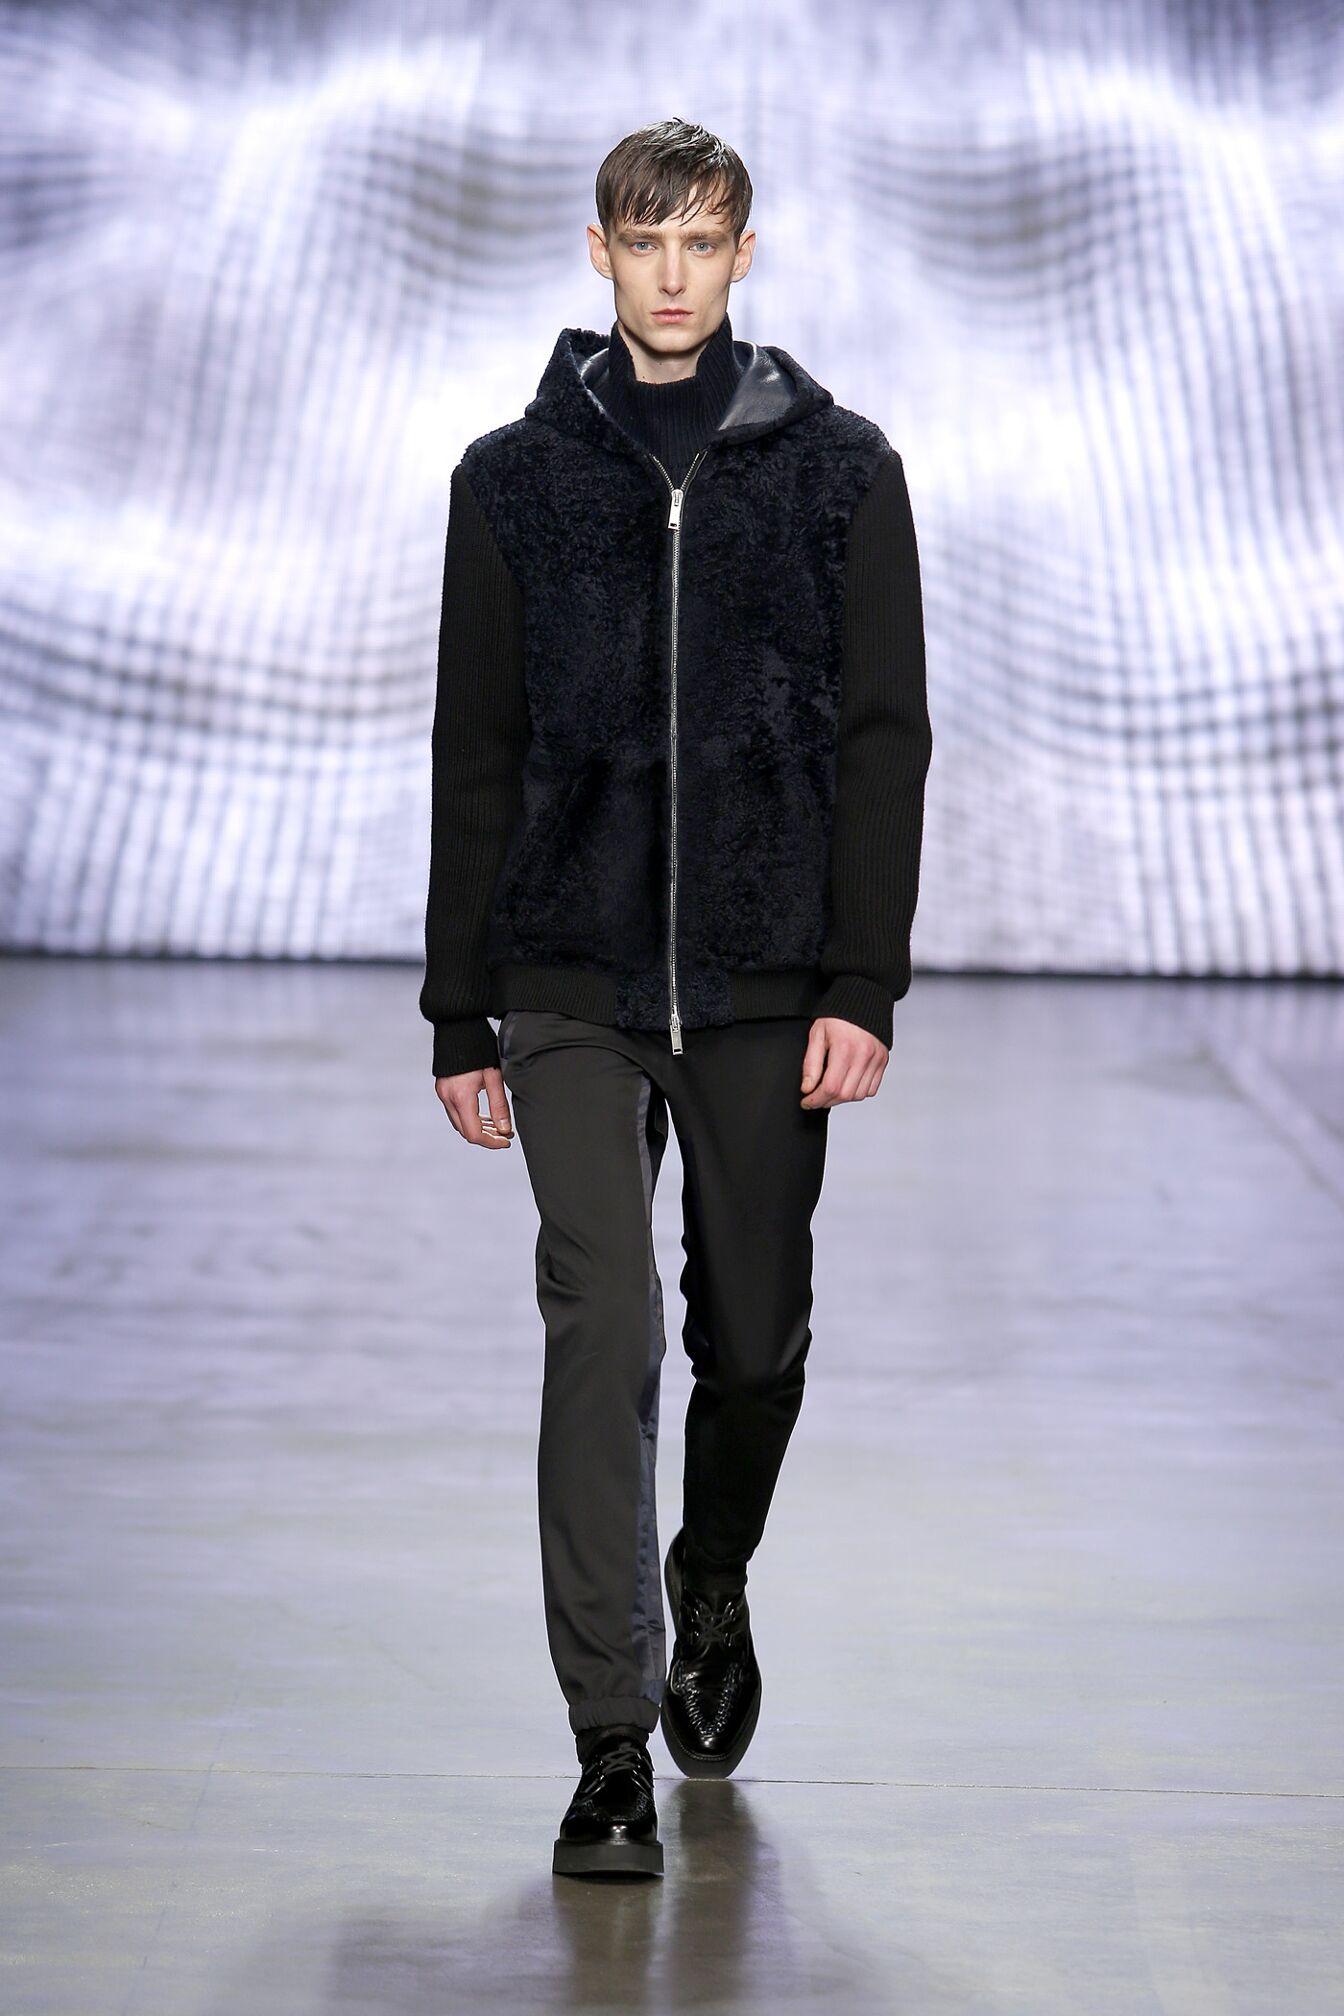 Catwalk Iceberg Fashion Show Winter 2014